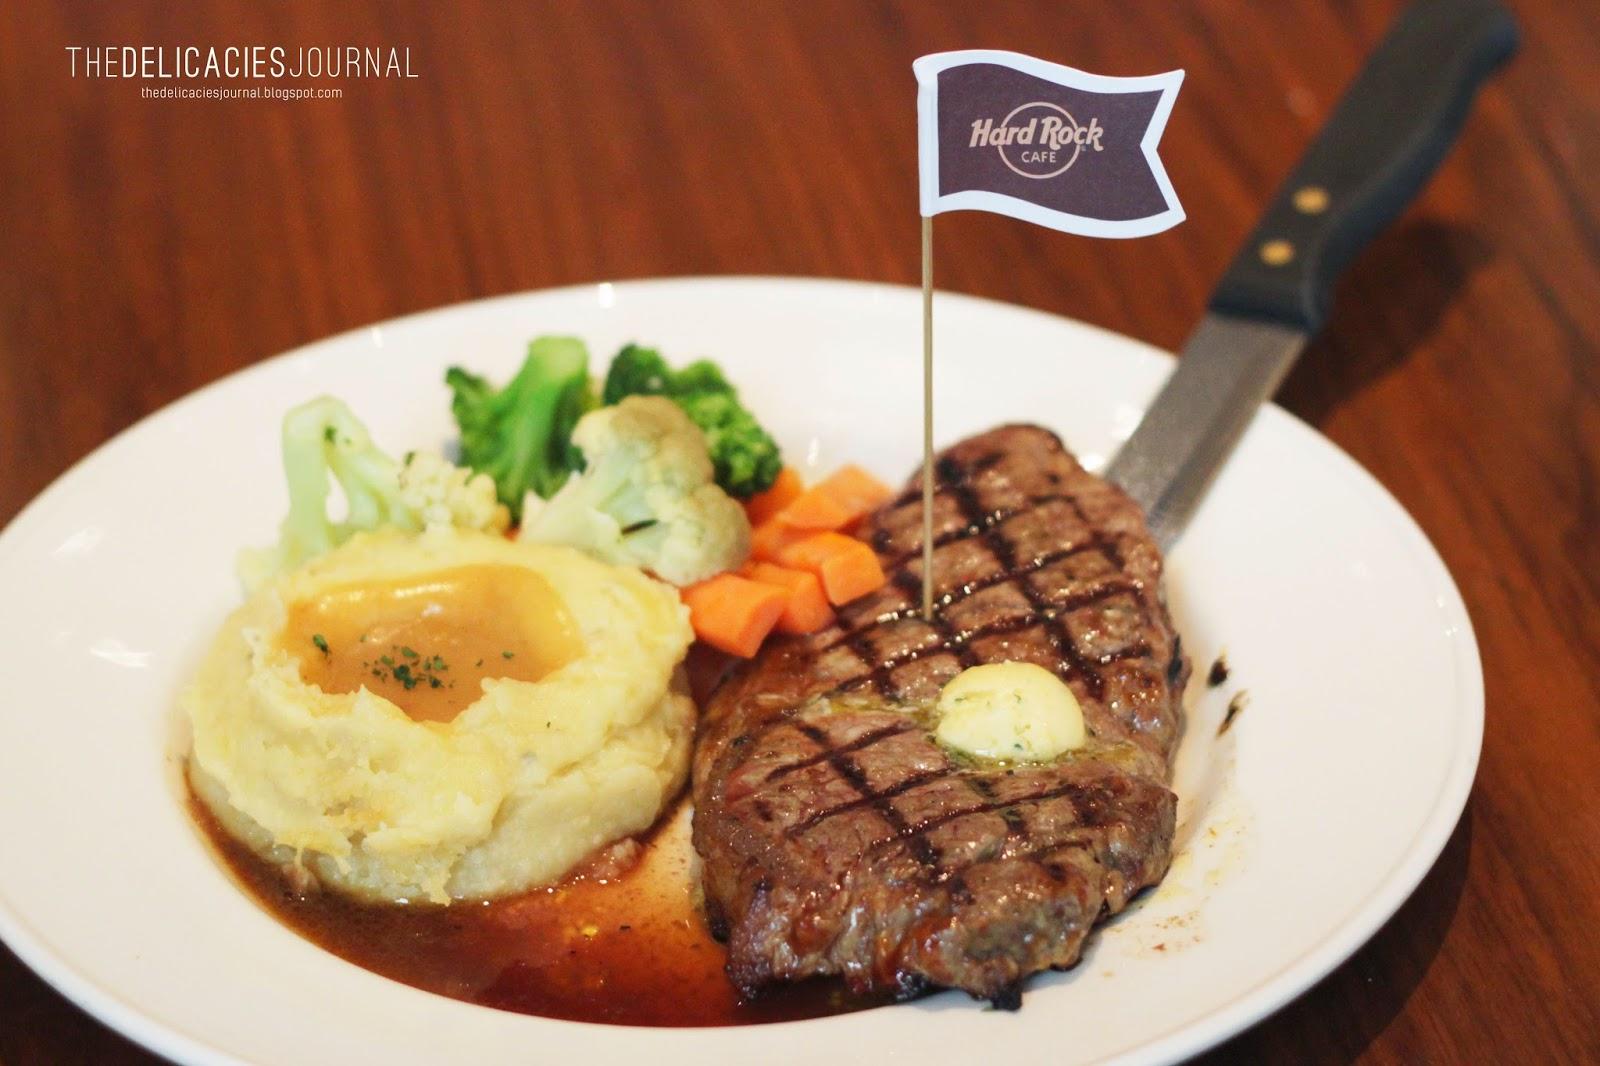 NY Steak vs NY Strip Steak - Seasoned